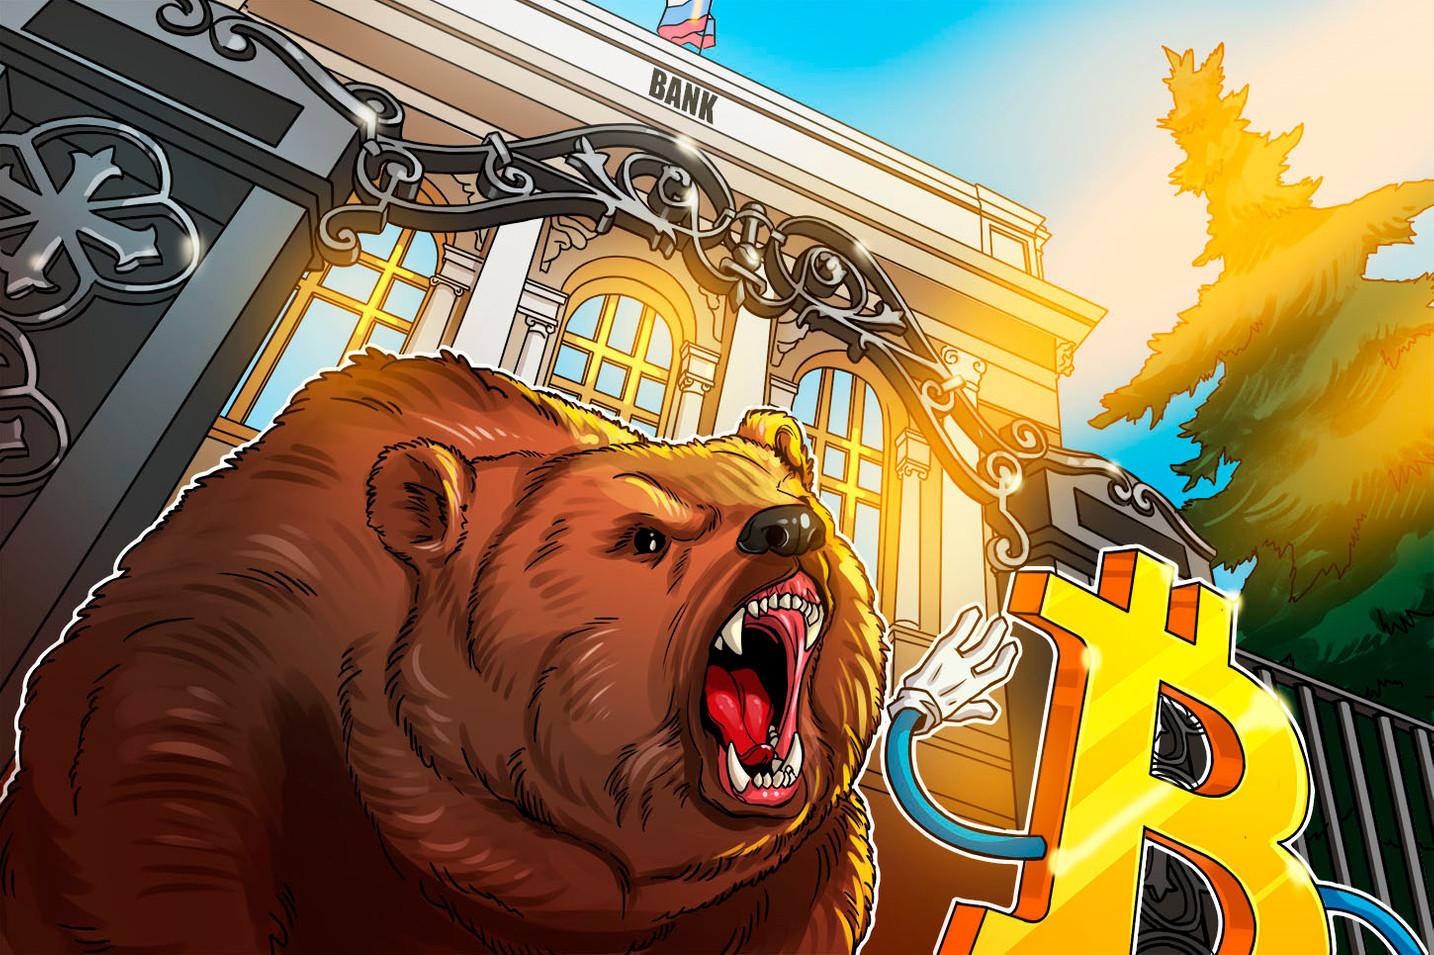 CEOs of top Russian banks Sberbank and VTB blast Bitcoin